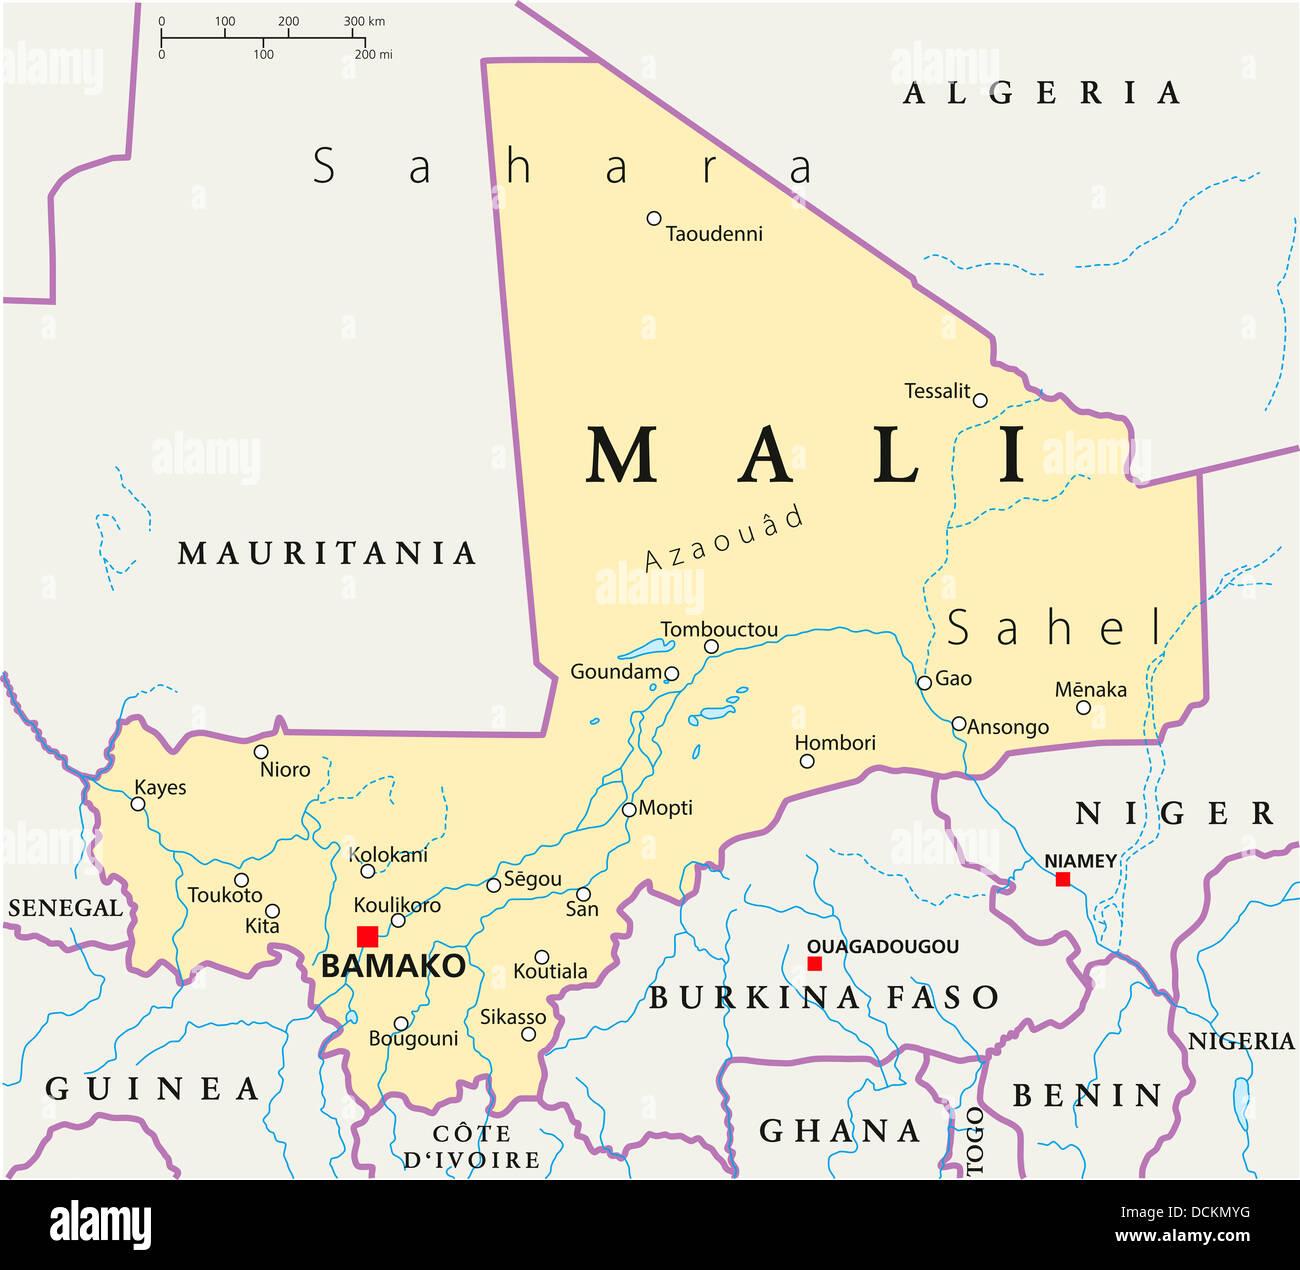 Mali Political Map Stock Photo: 59440516 - Alamy